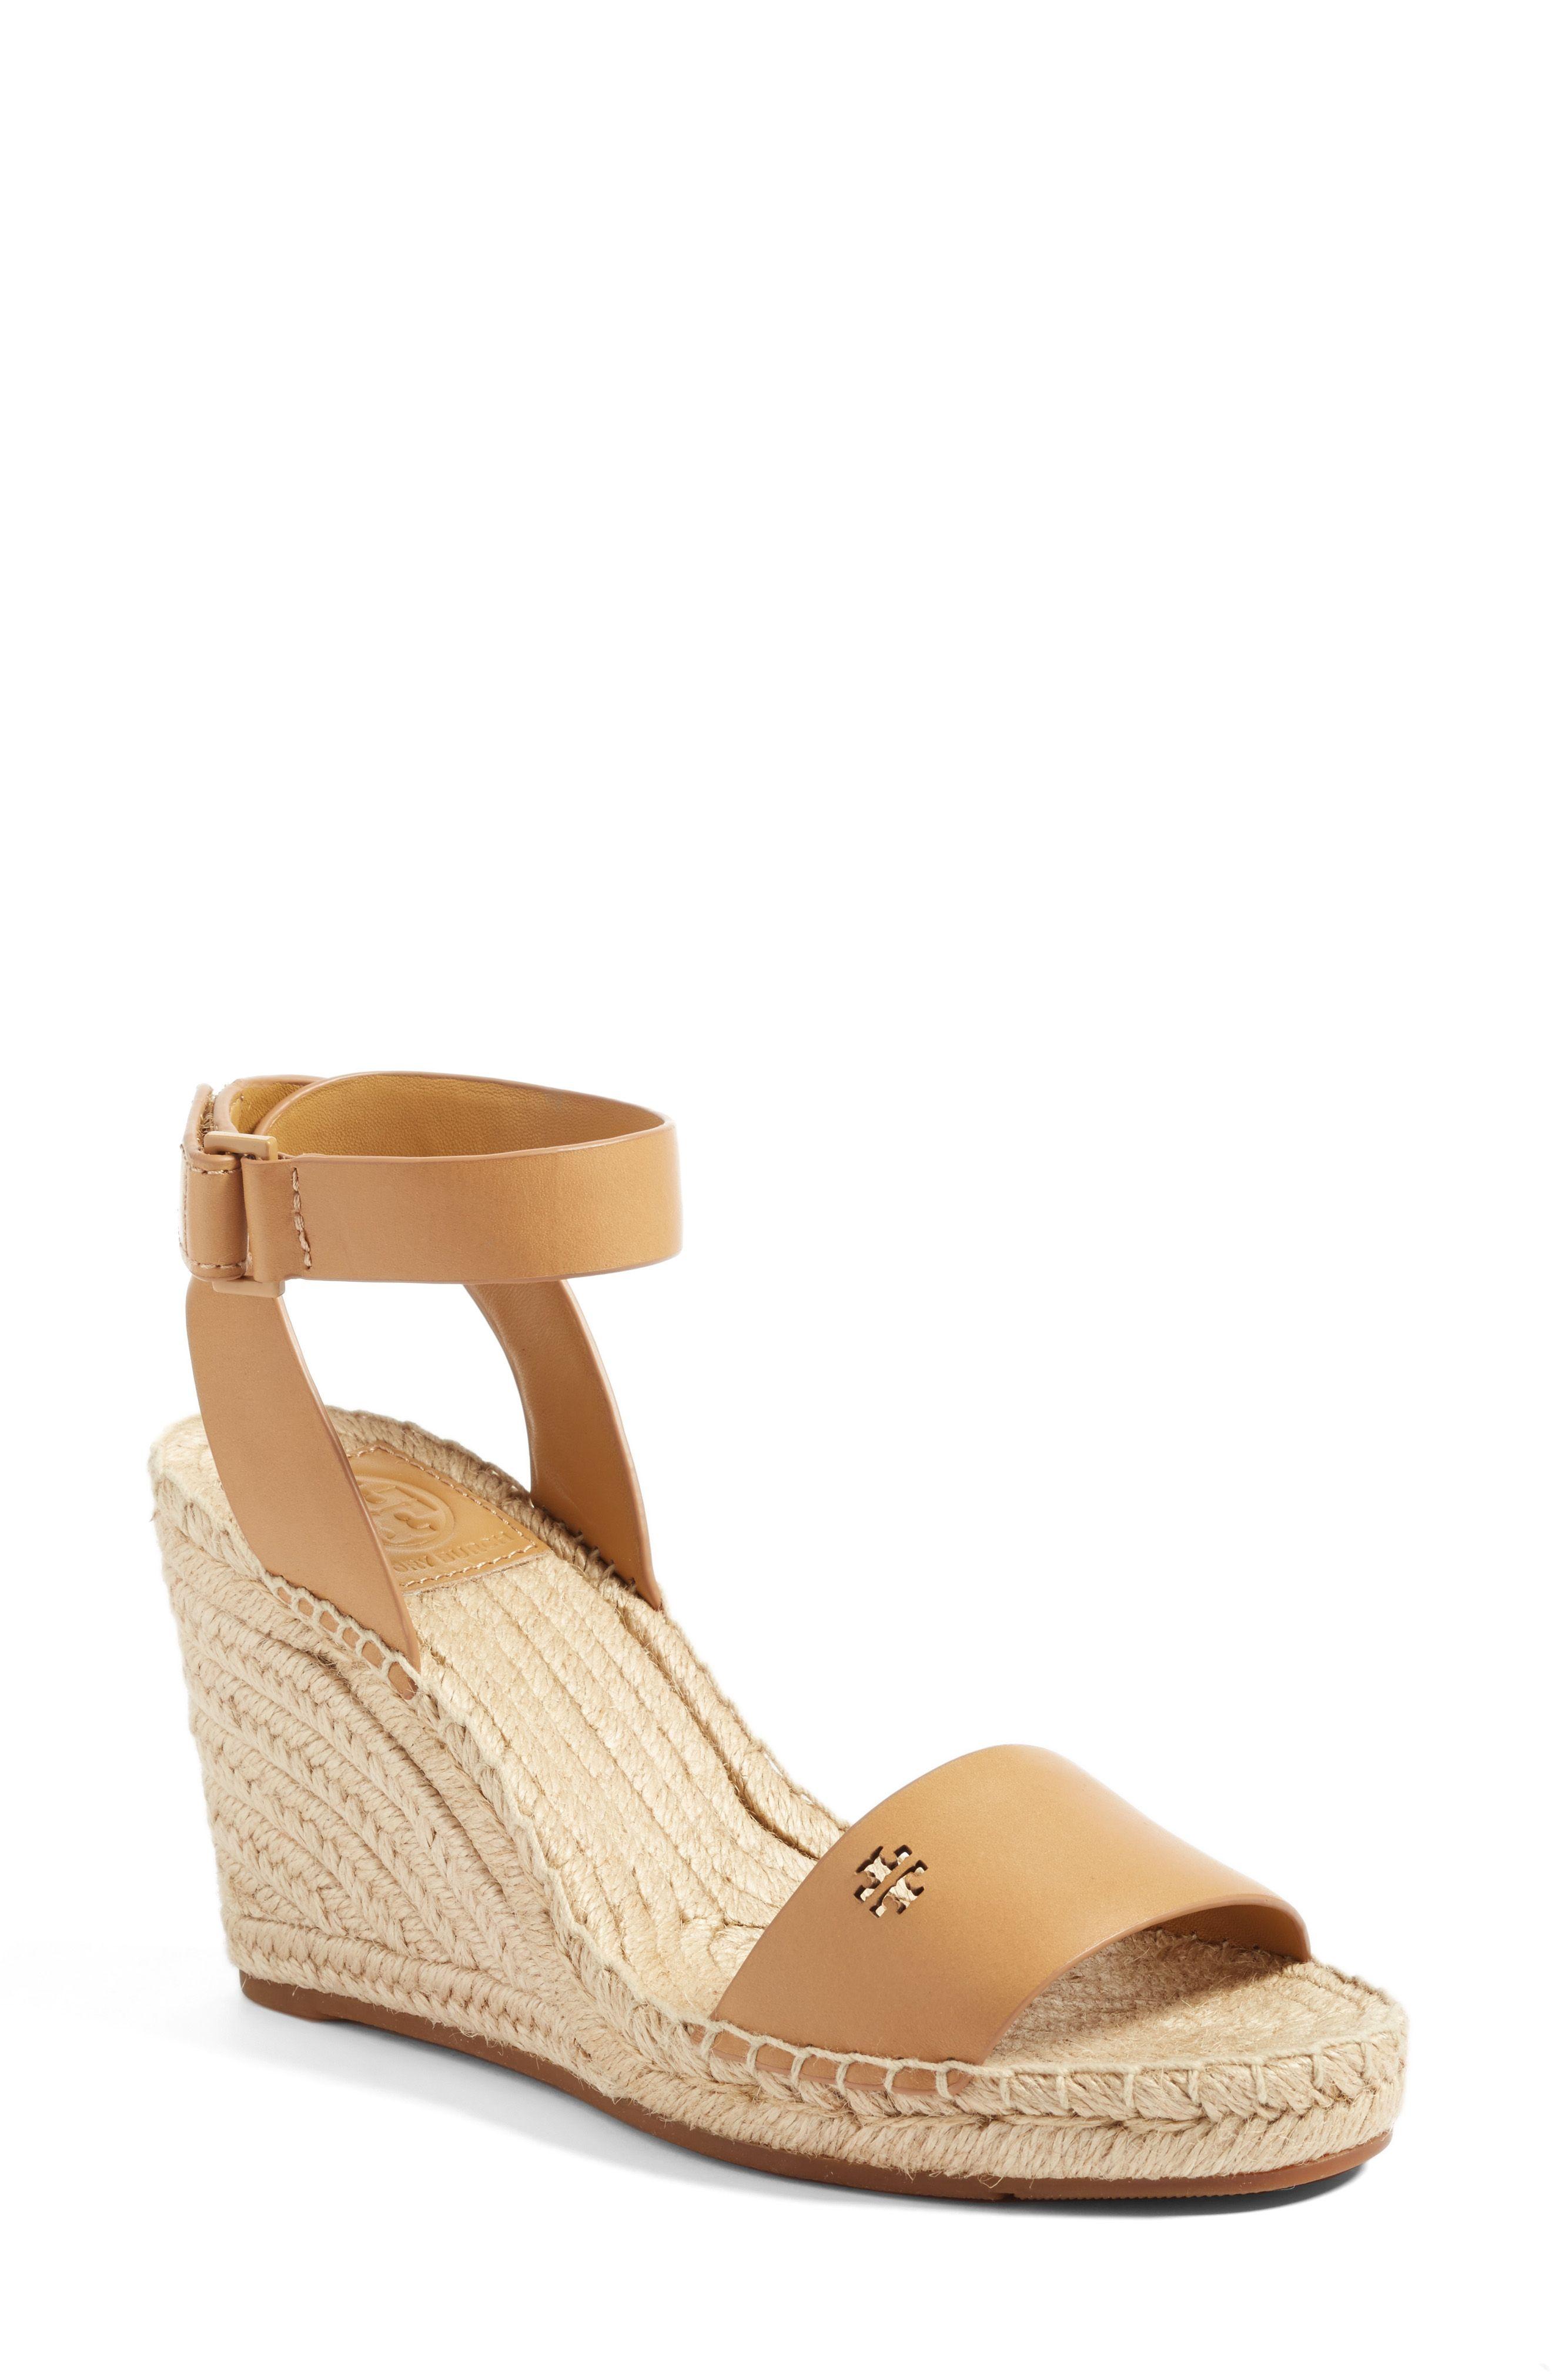 Bima 2 Espadrille Espadrilles Womens Heels Womens Sandals